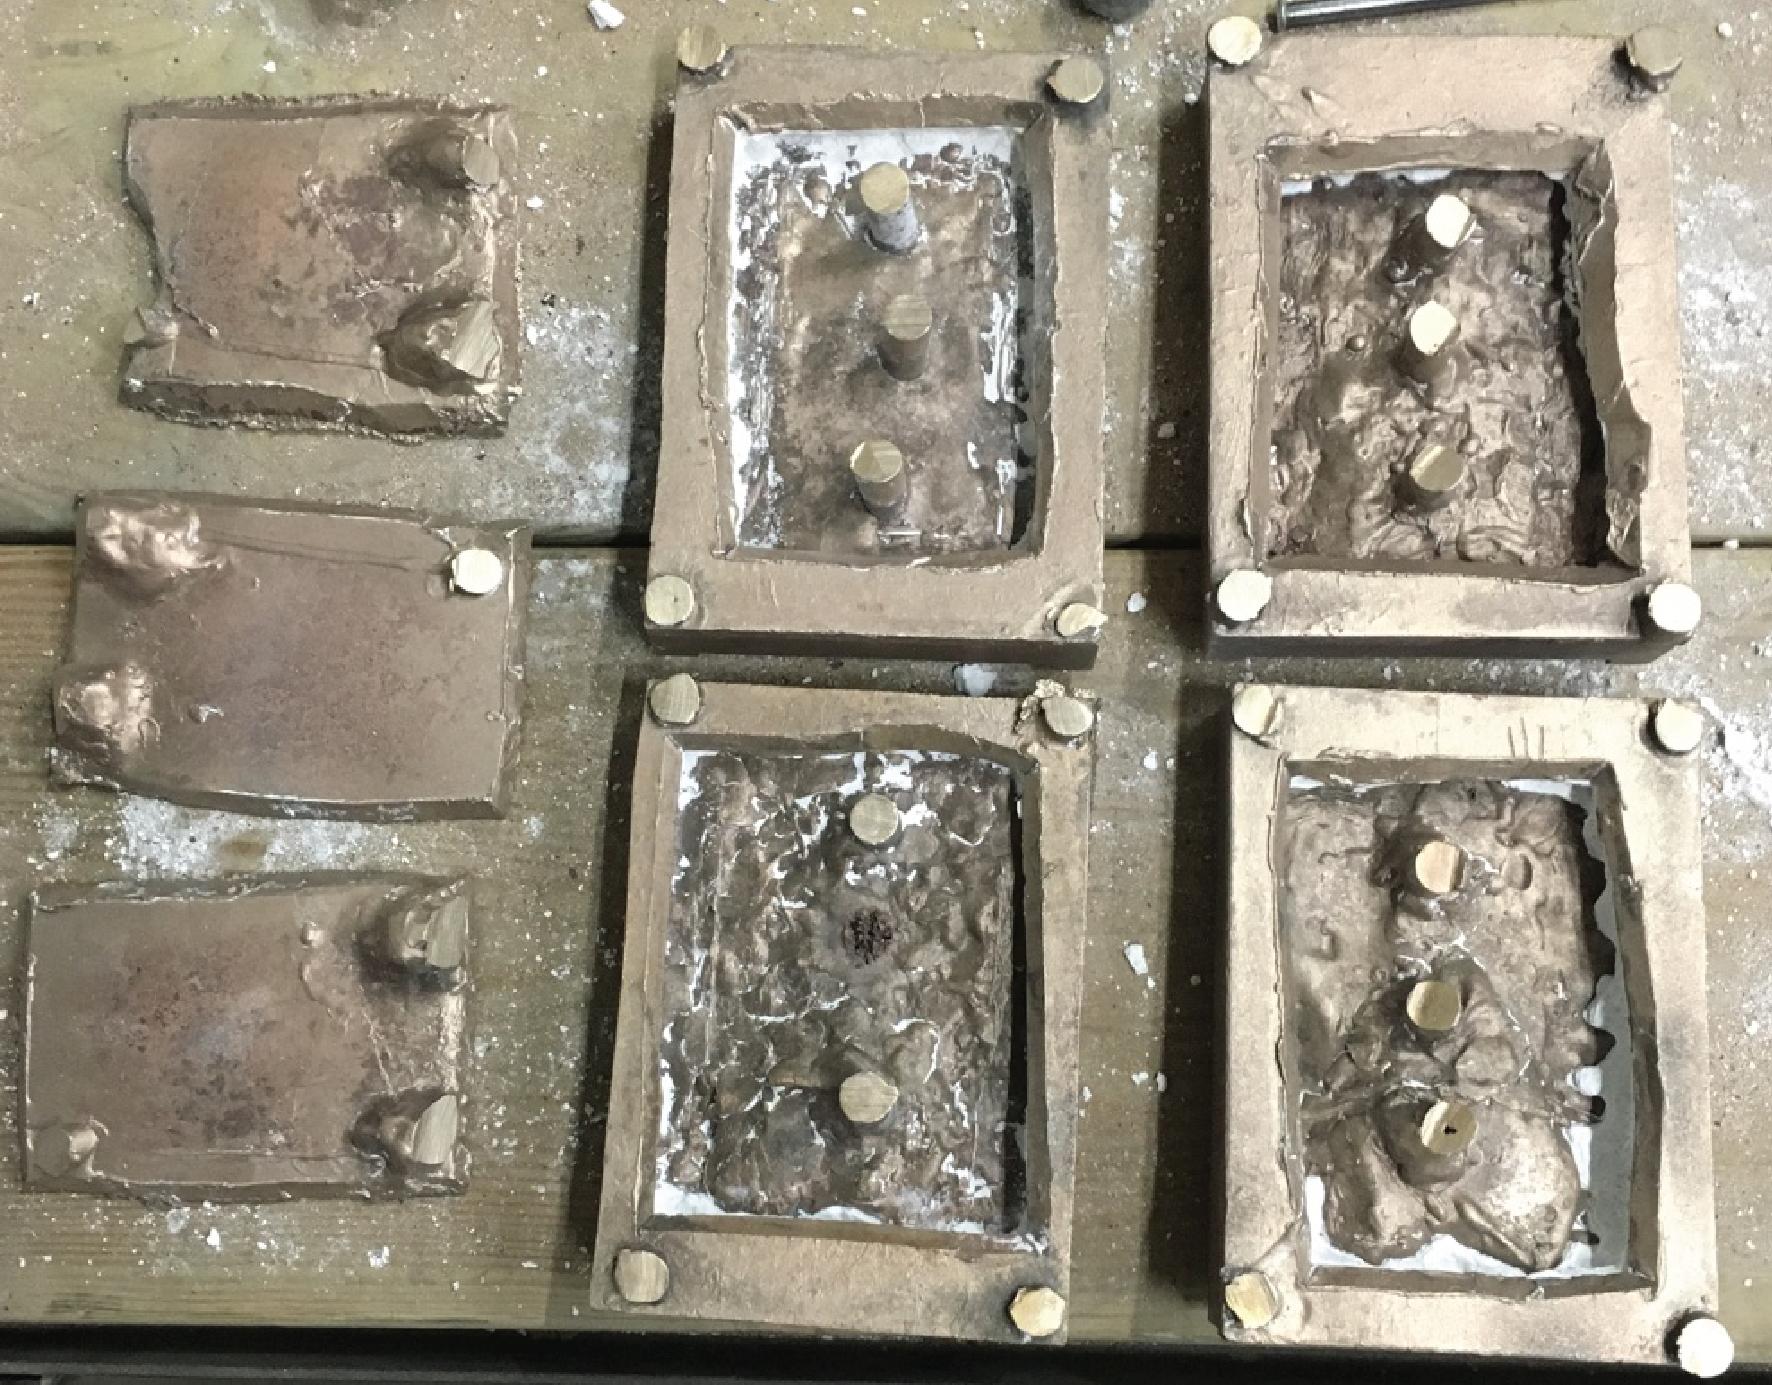 backs after removing the ceramic shells